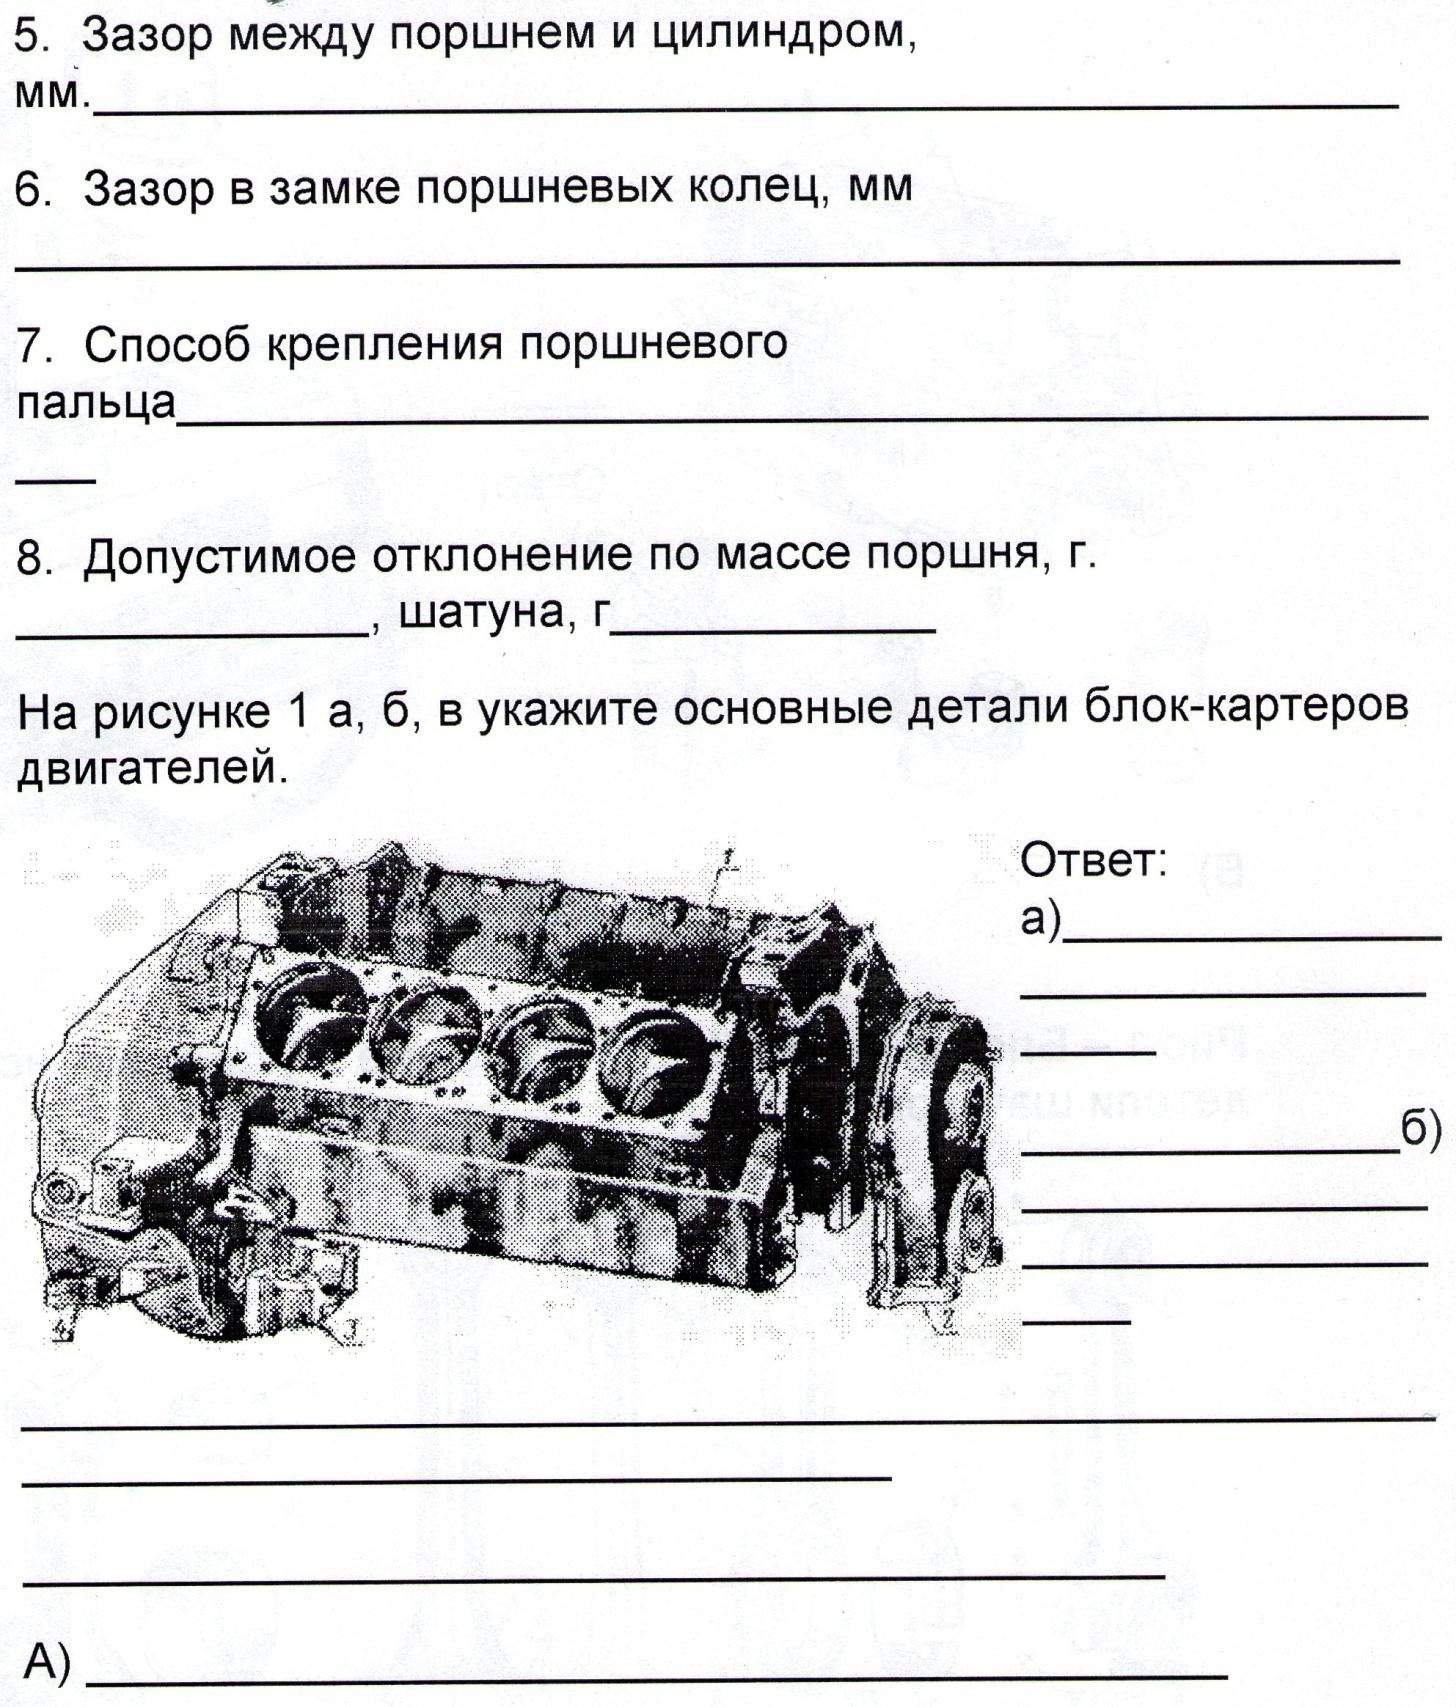 C:\Users\Василий Мельченко\Pictures\img584.jpg